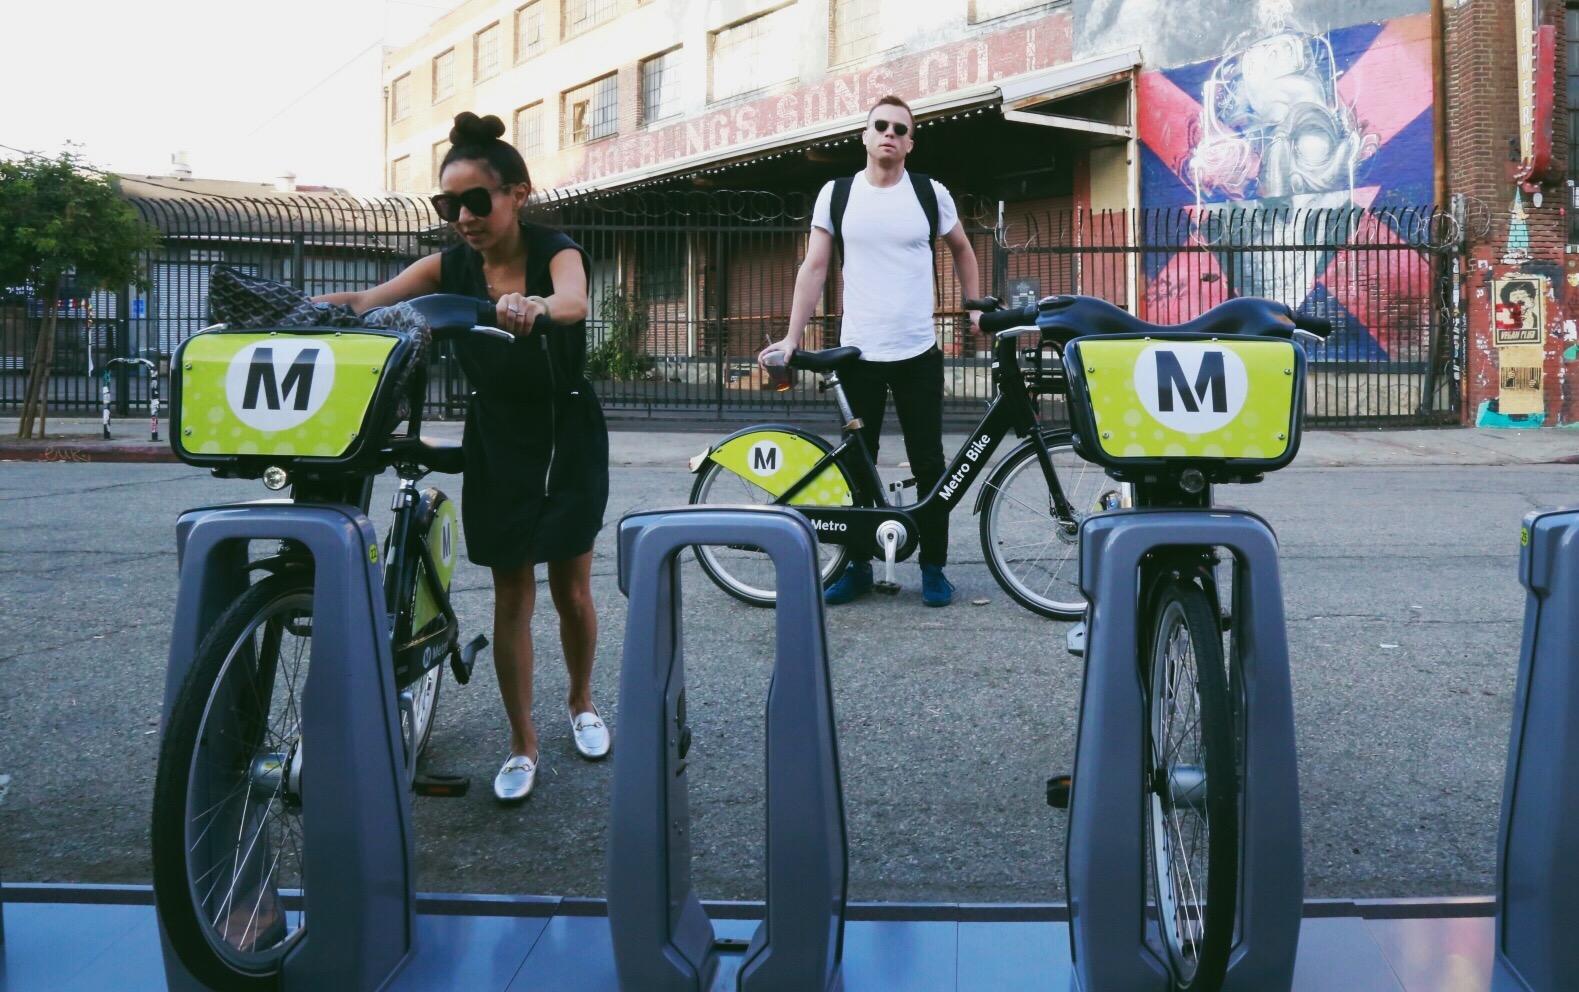 MetroBike/Gold Line to Pasadena -